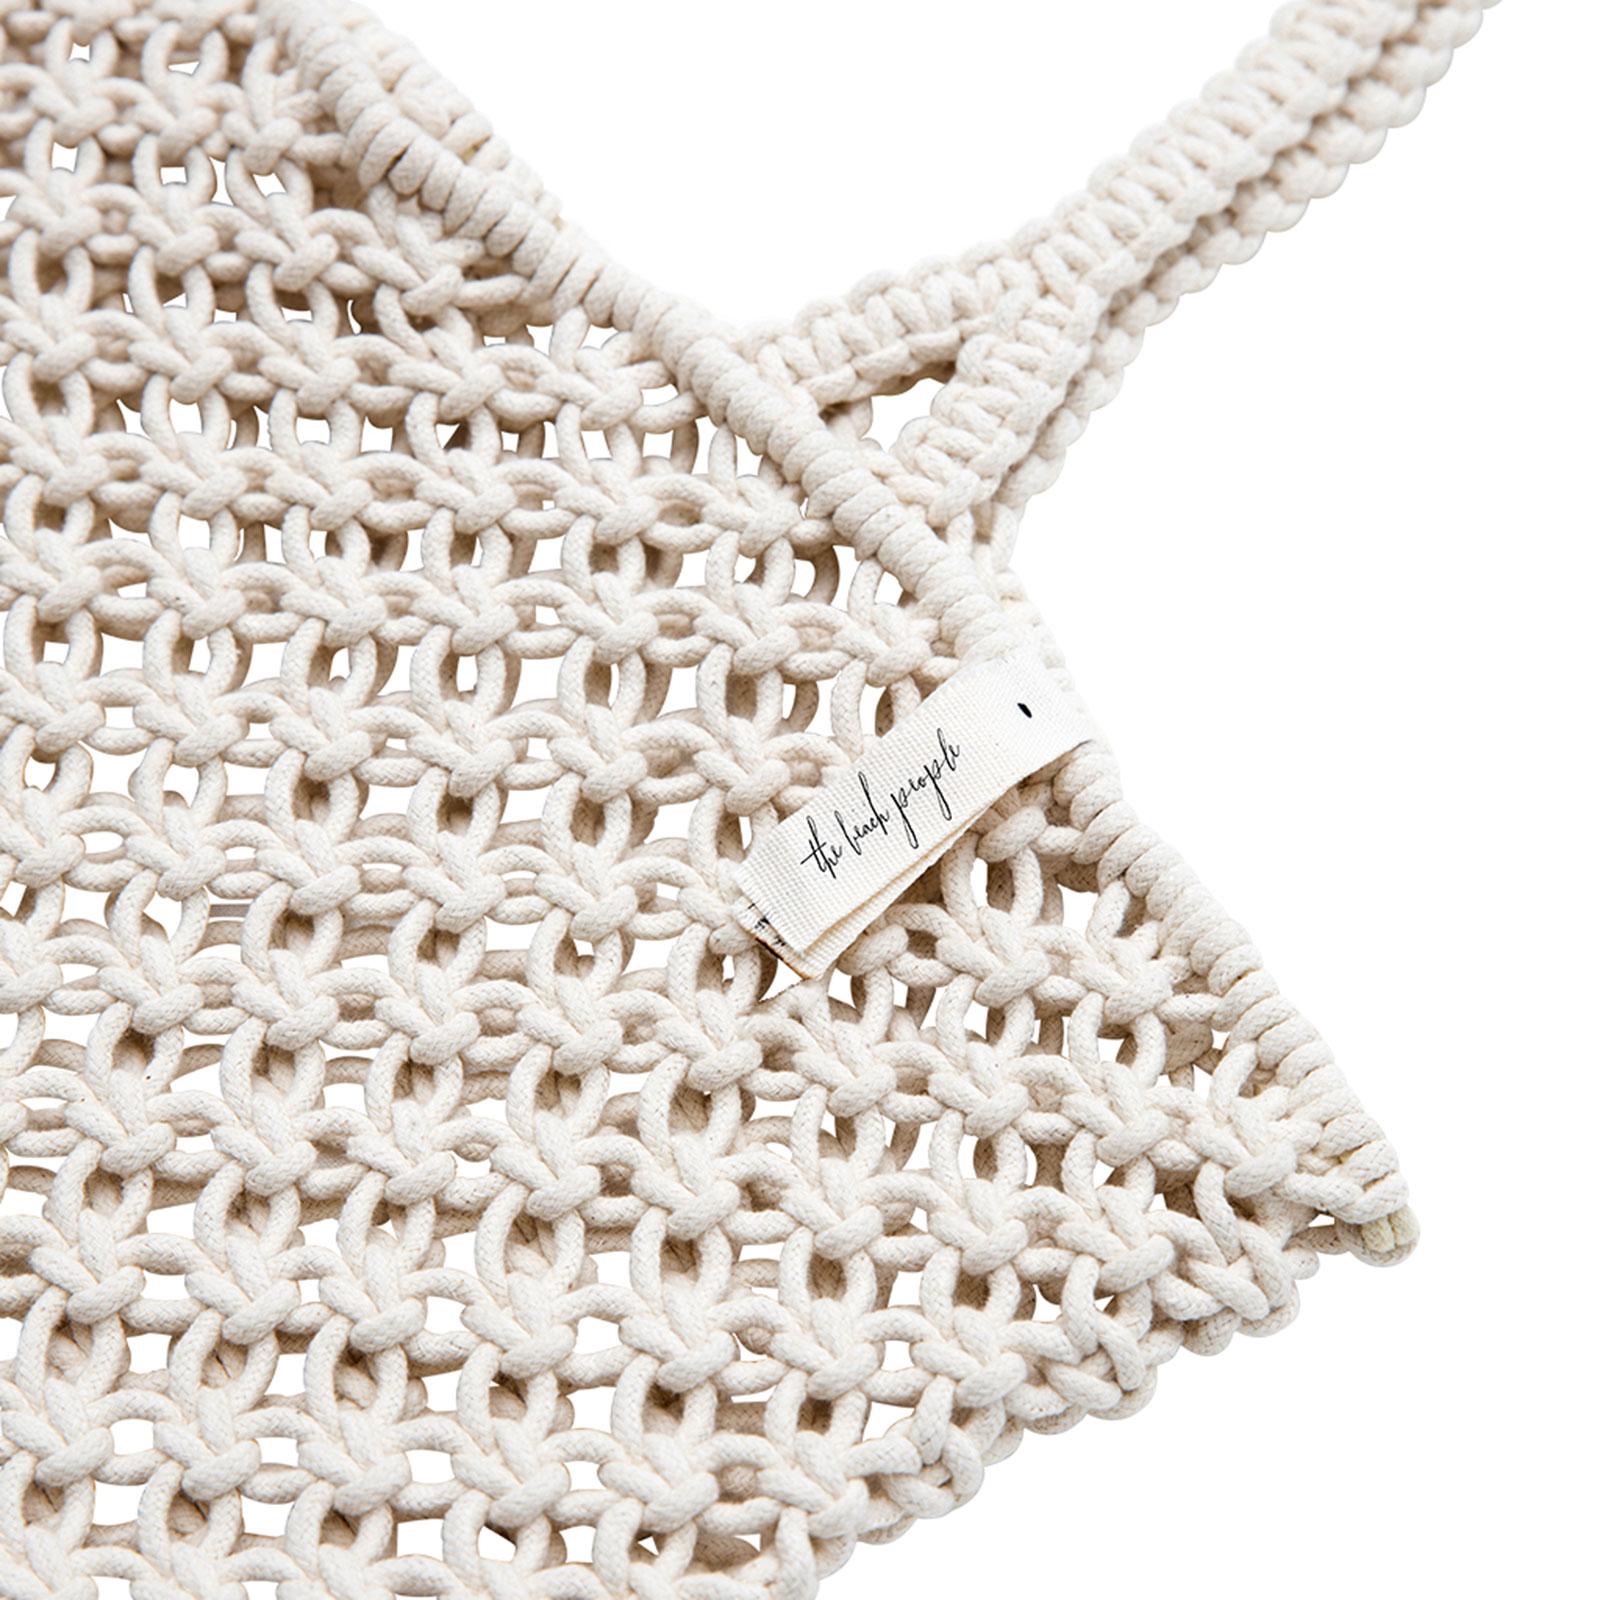 sac de plage sac cabas en macram blanc fait main macrame branco. Black Bedroom Furniture Sets. Home Design Ideas